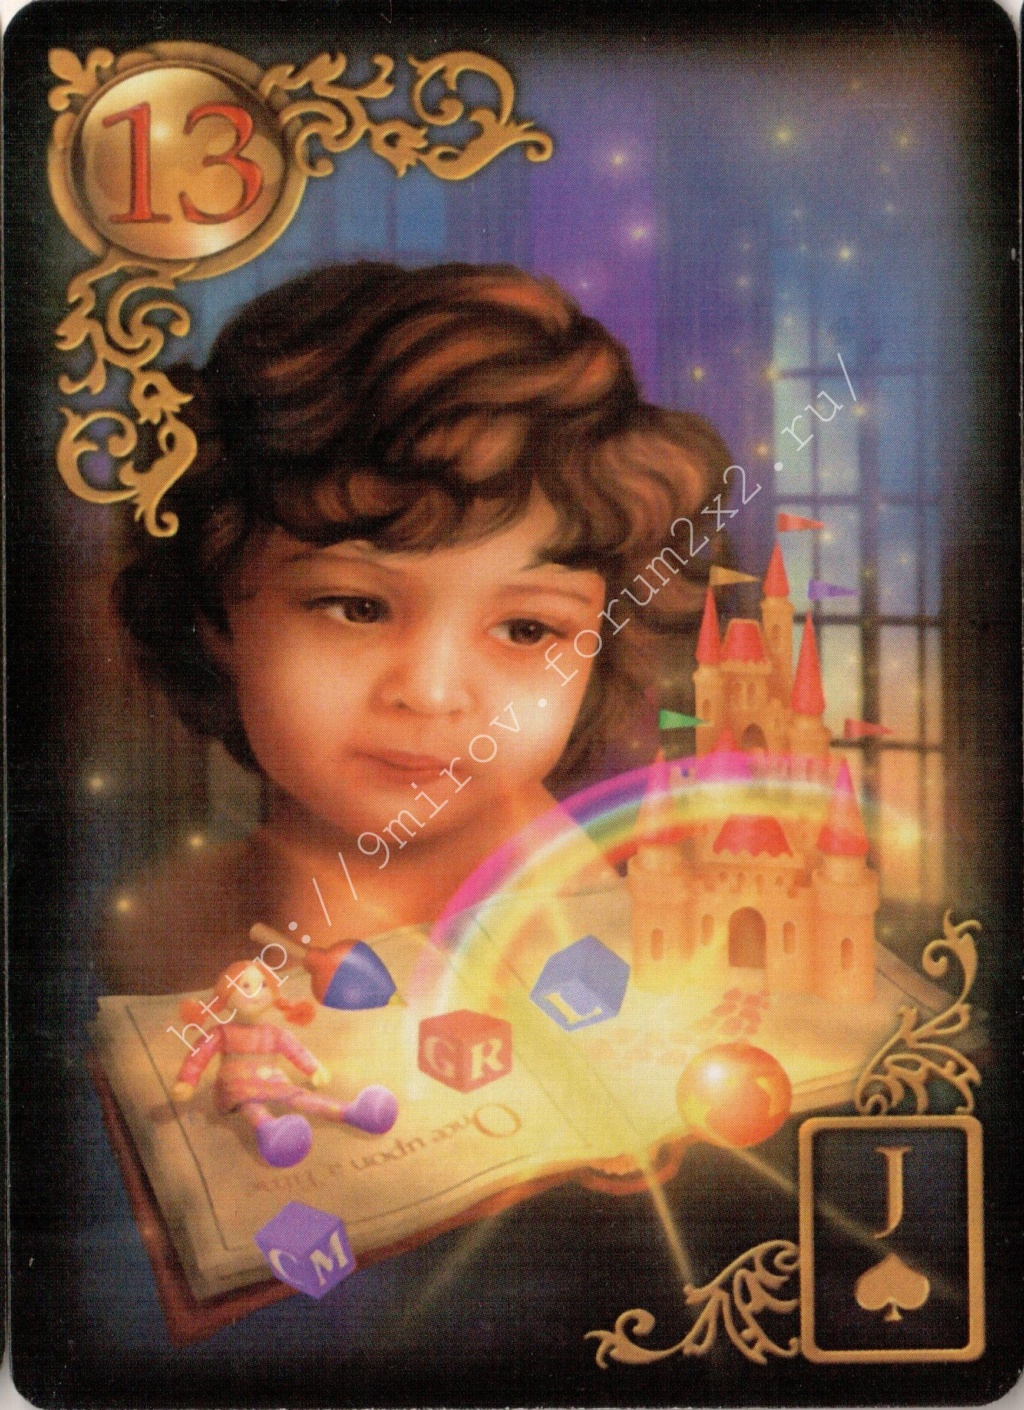 Золотые мечты Ленорман (Расширенное издание) | Gilded Reverie Lenormand. Галерея.  Water108